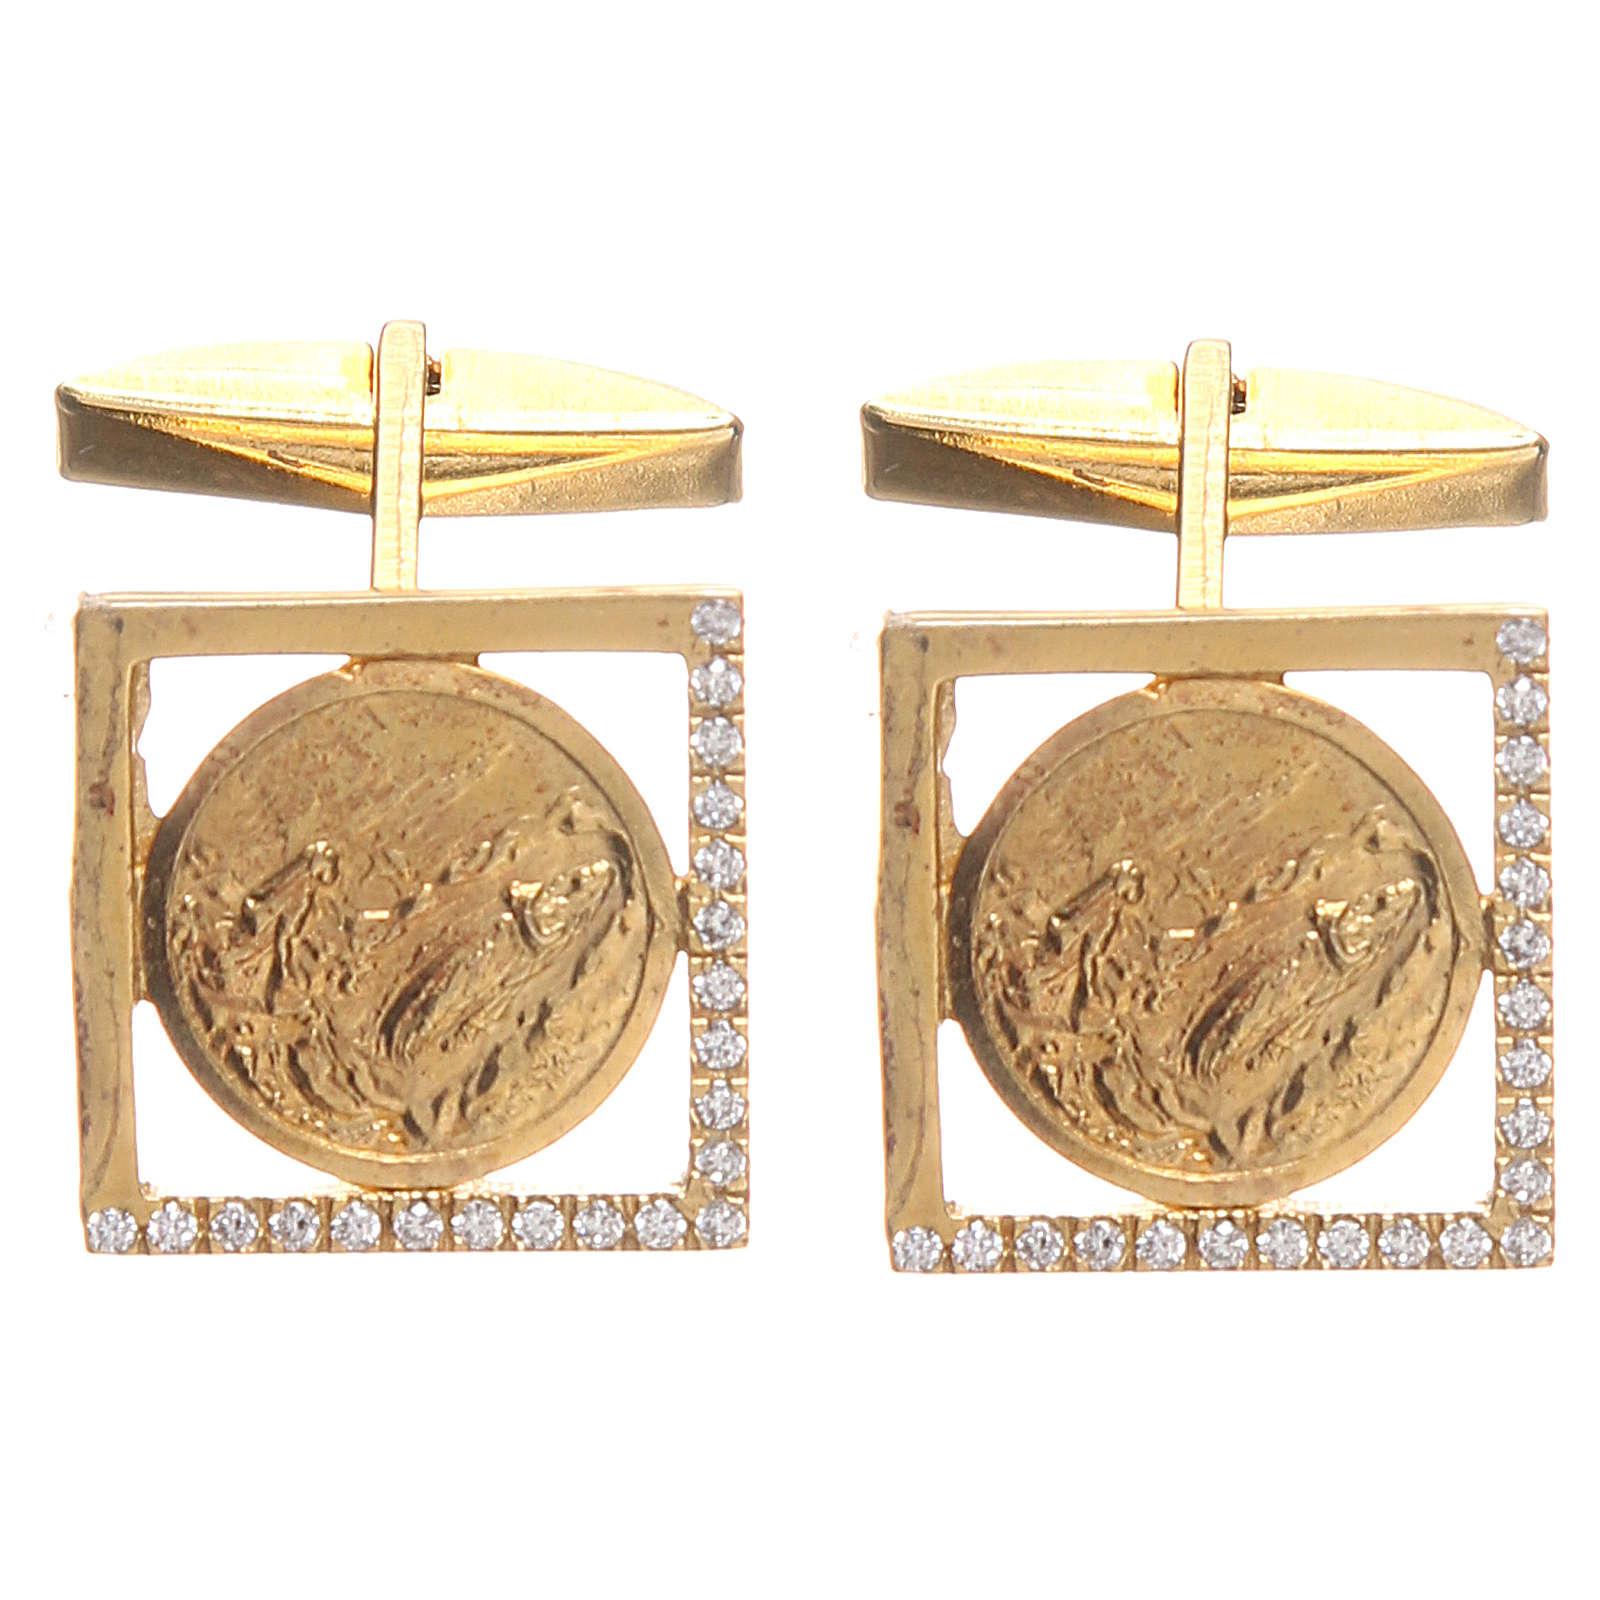 Spinki do koszuli srebro 925 pozłacane Madonna z Lourdes 1.7x1.7 cm 4